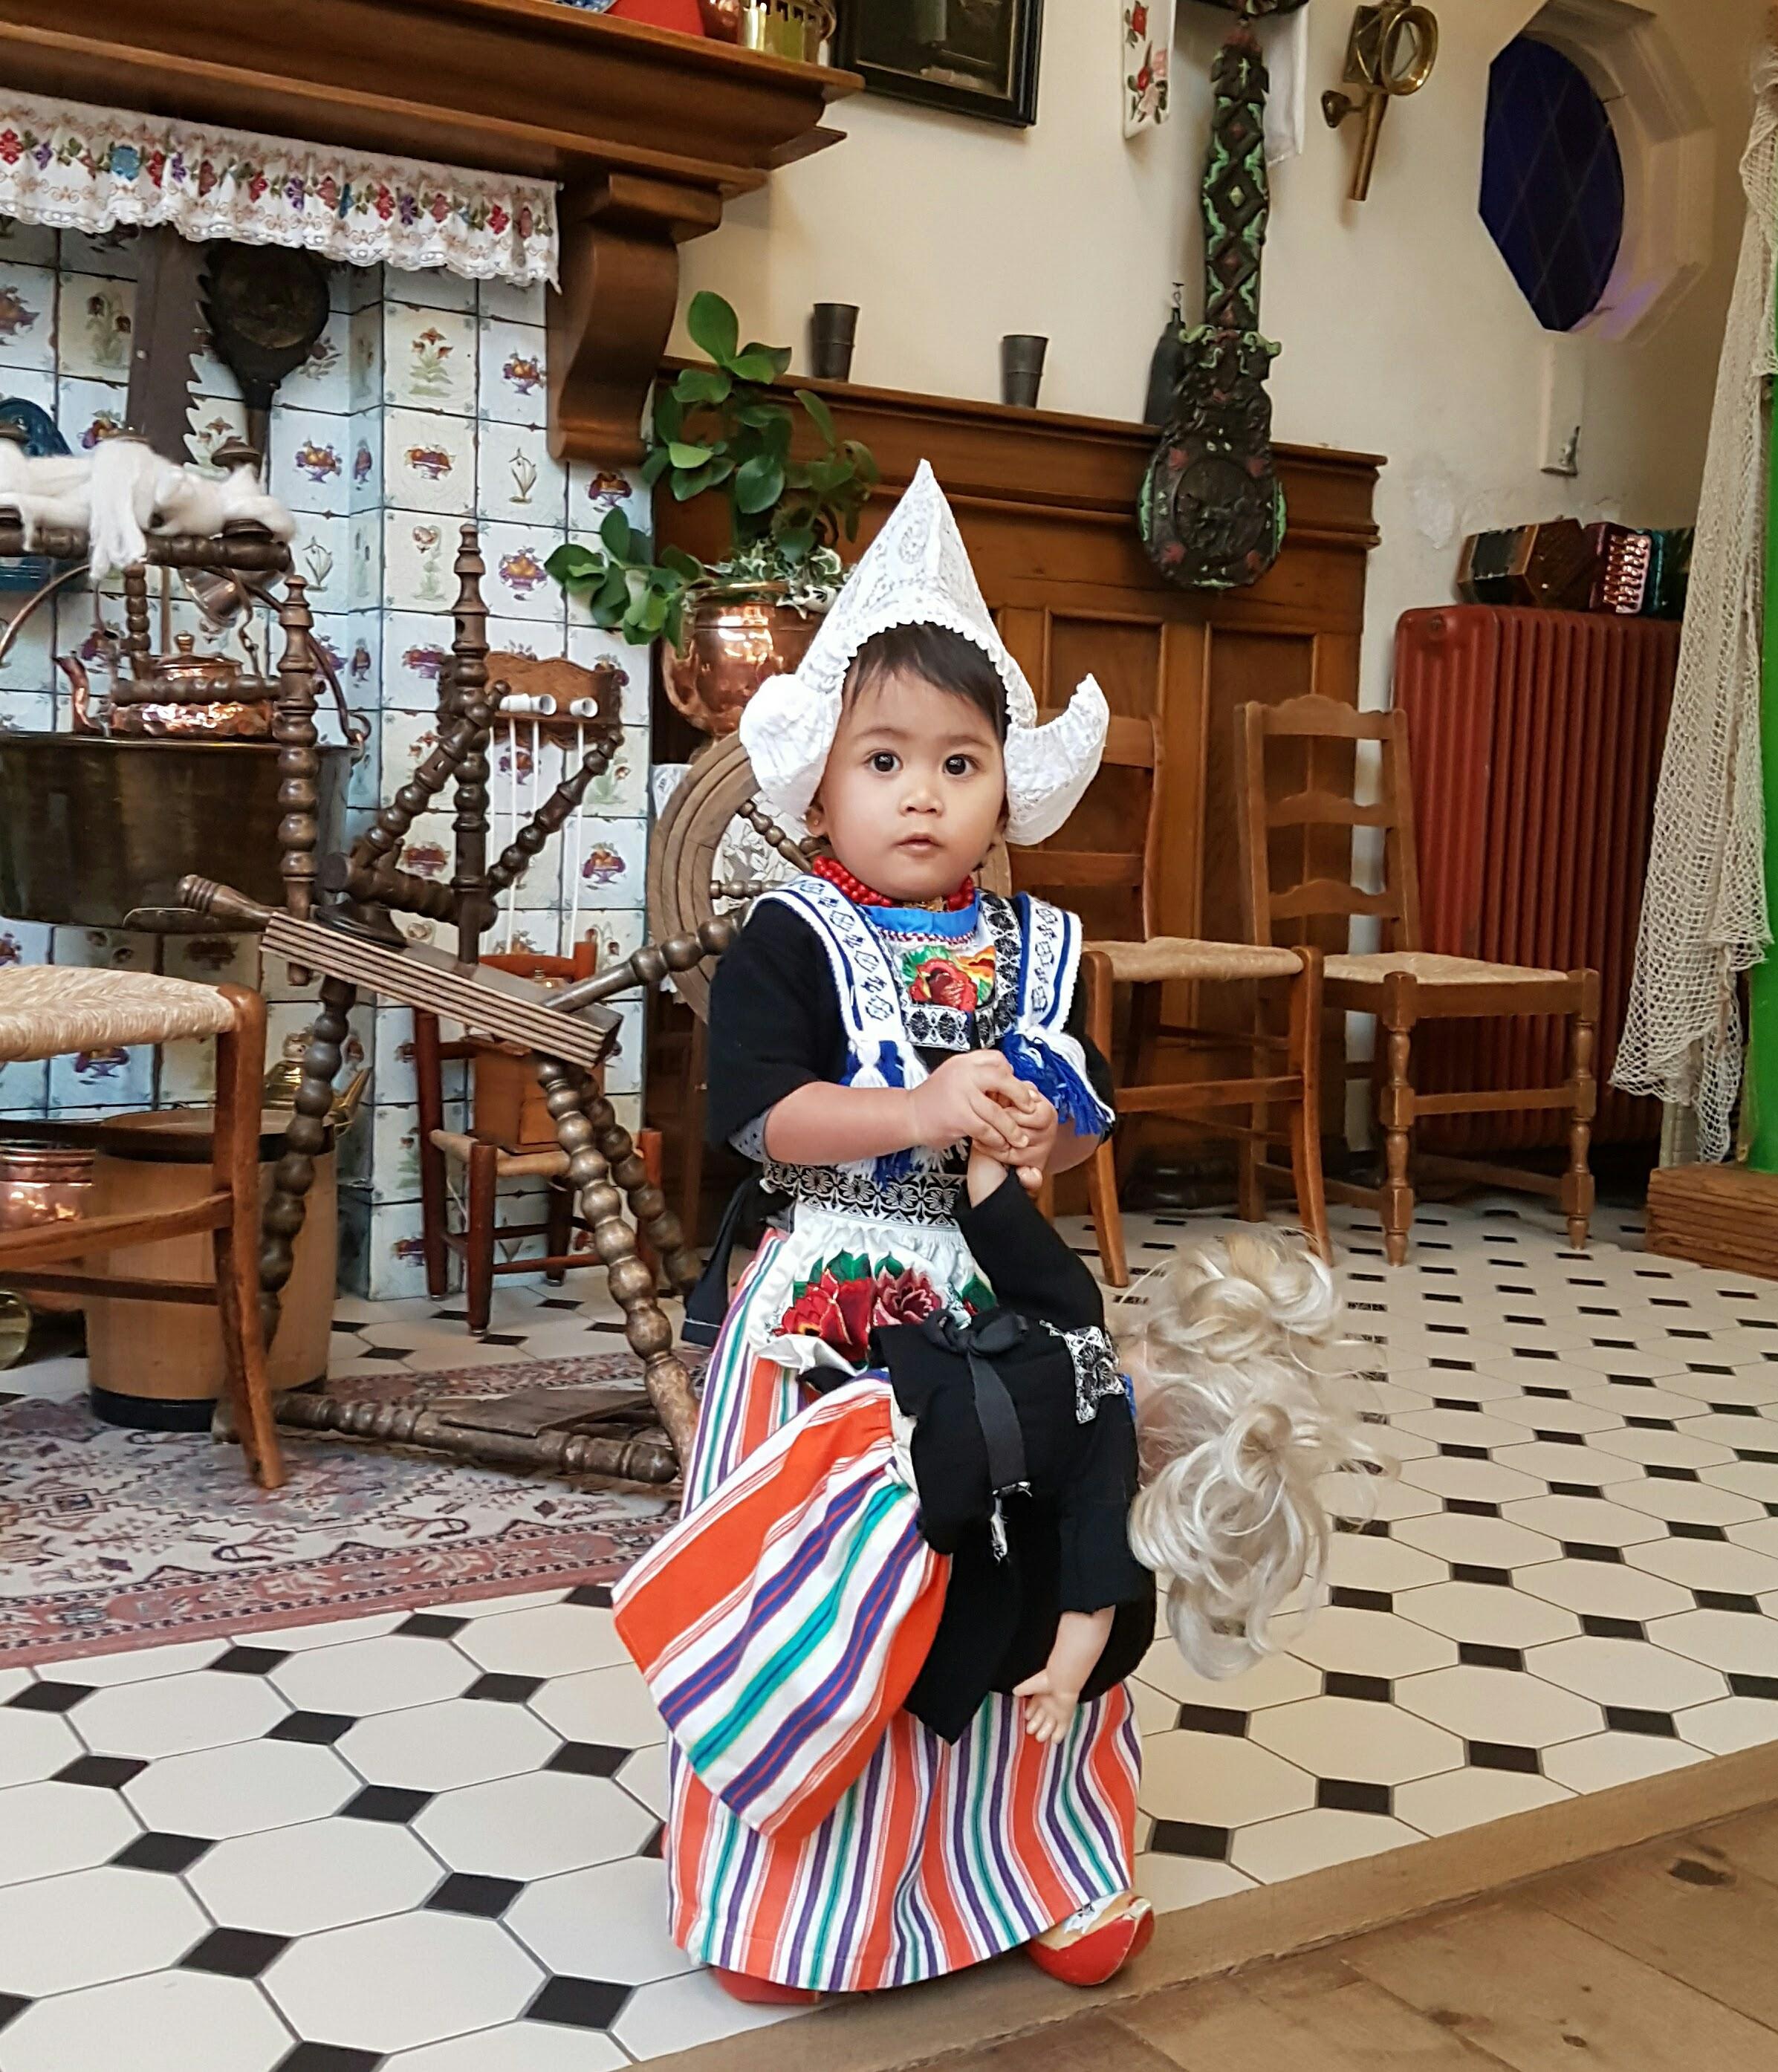 Berbusana Pakaian Tradisional di Belanda. Mengikuti jejak Titiek Puspa, Gus Dur, Cak Lontong, Ruban Onsu, Megawati, Rafli Ahmad dan lainnya. Artis-artis Indonesia.